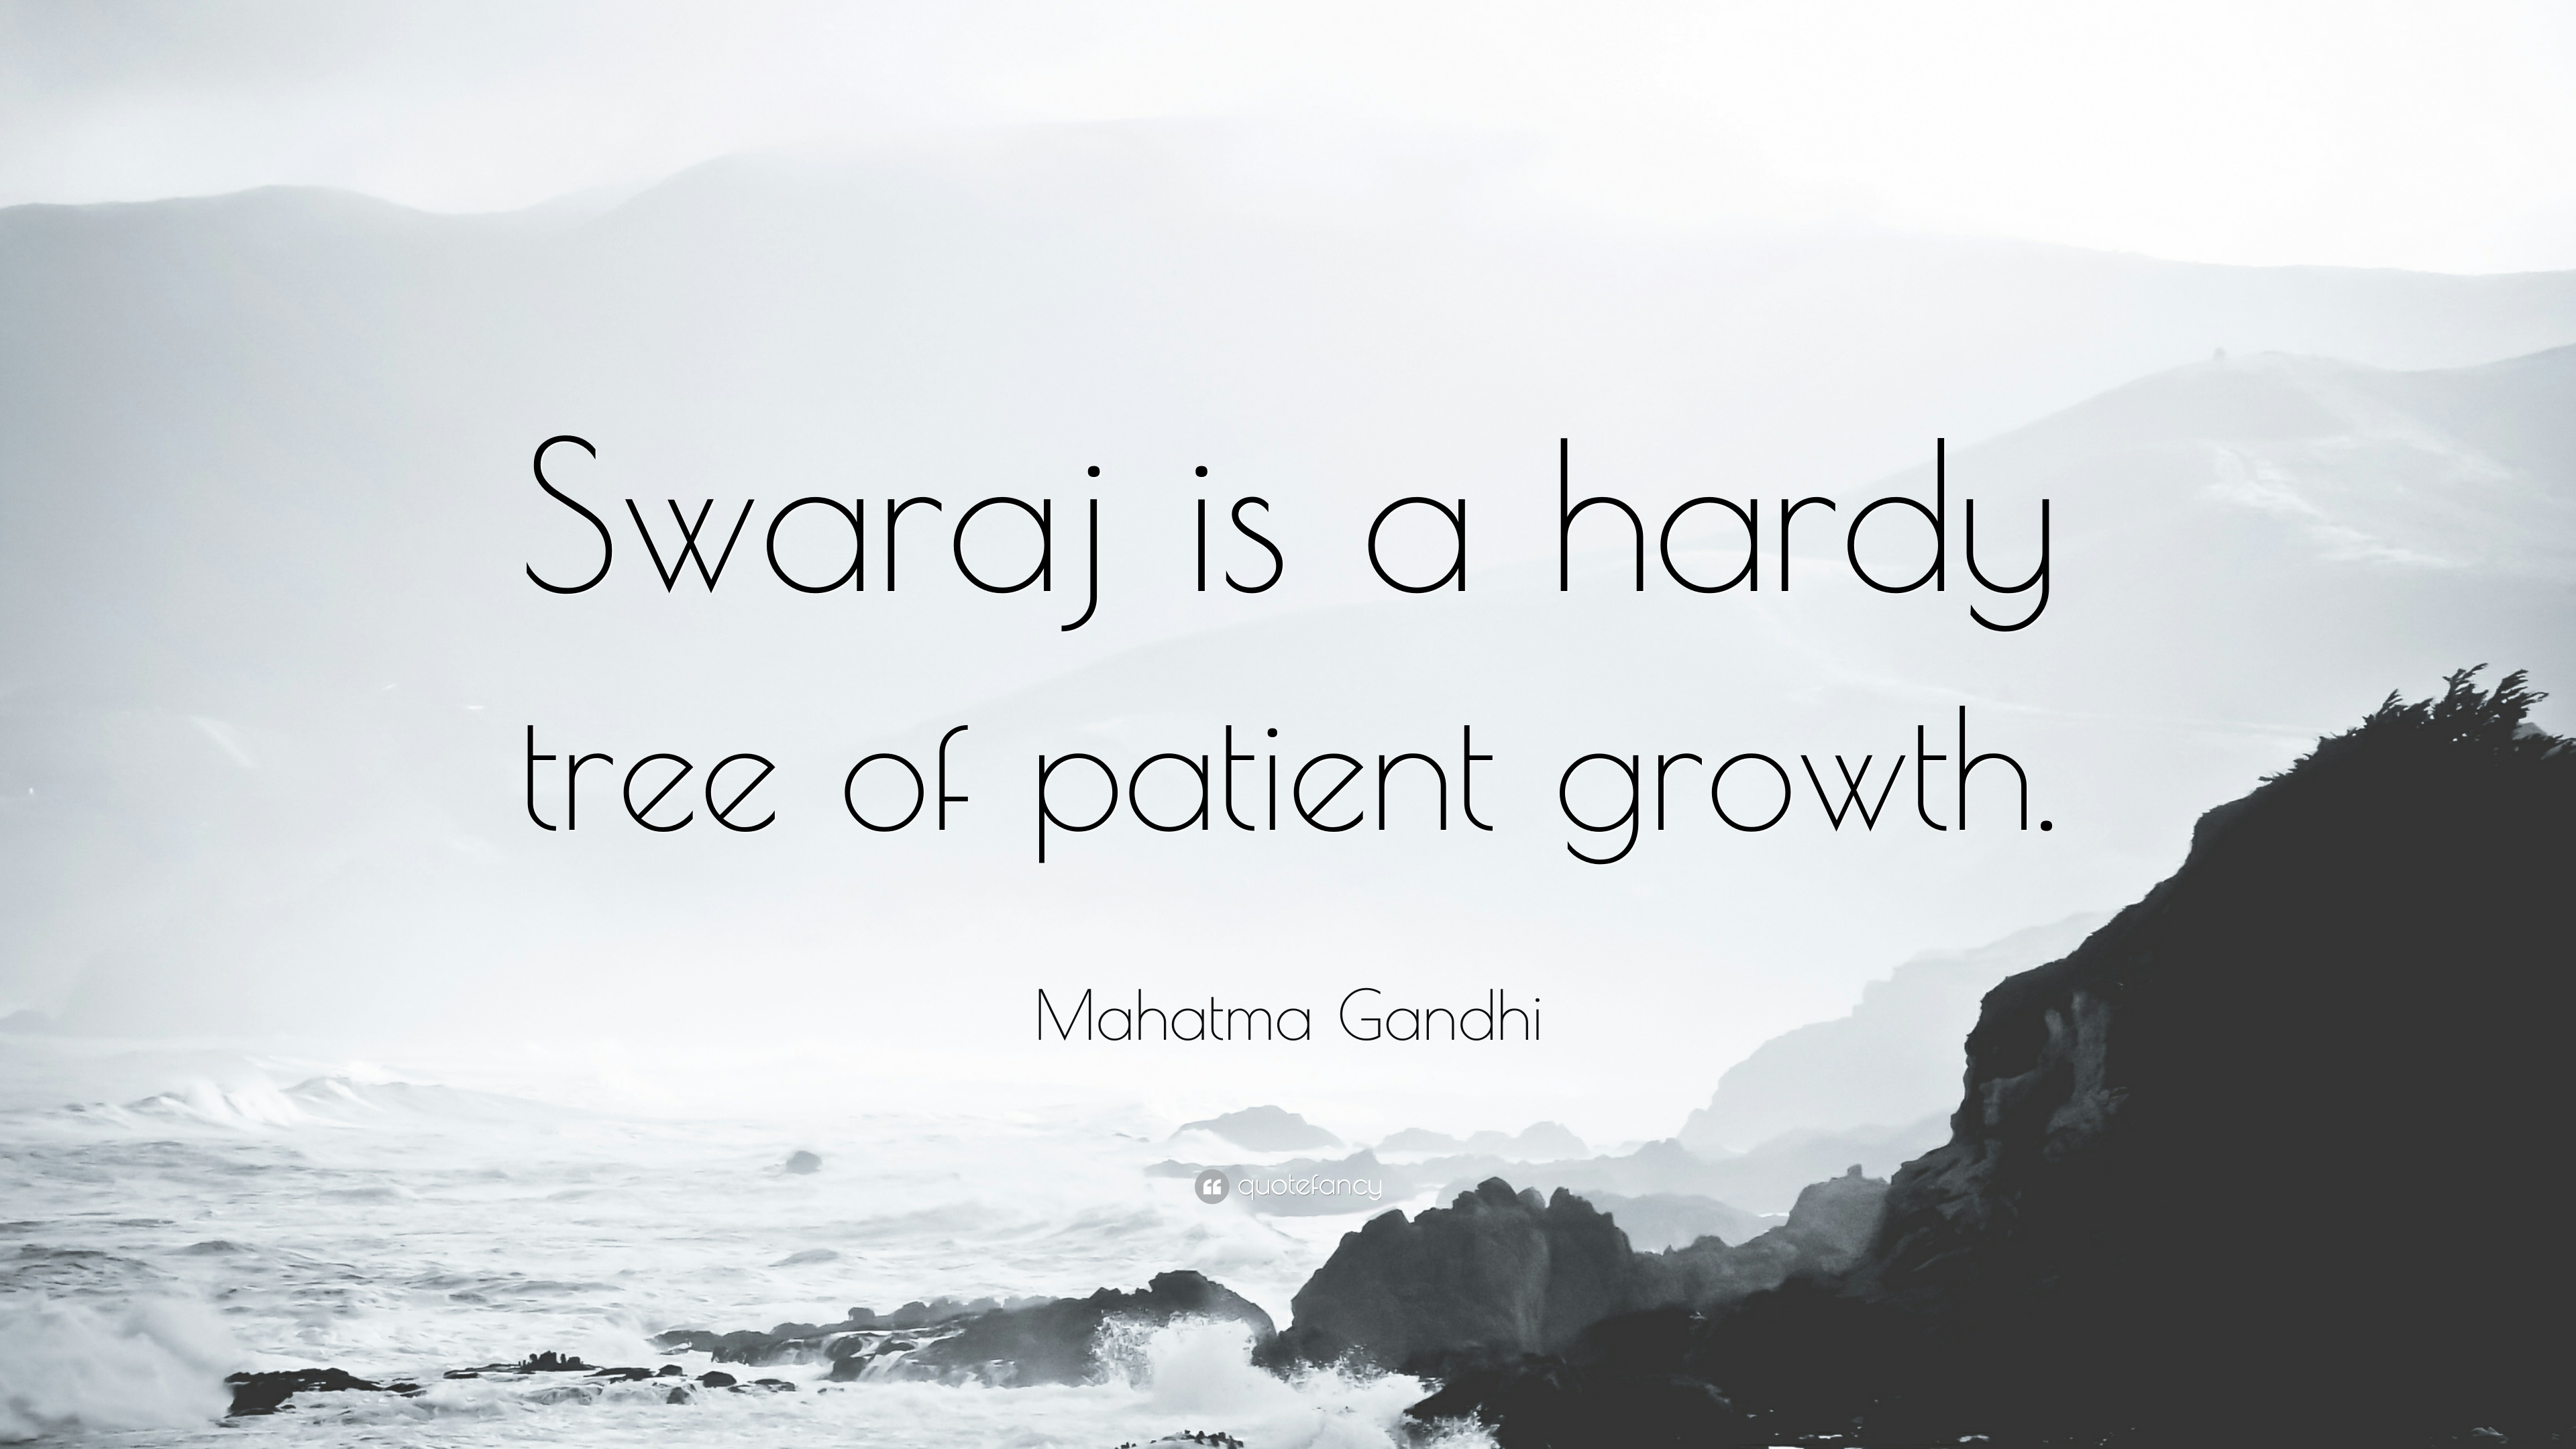 gandhi swaraj